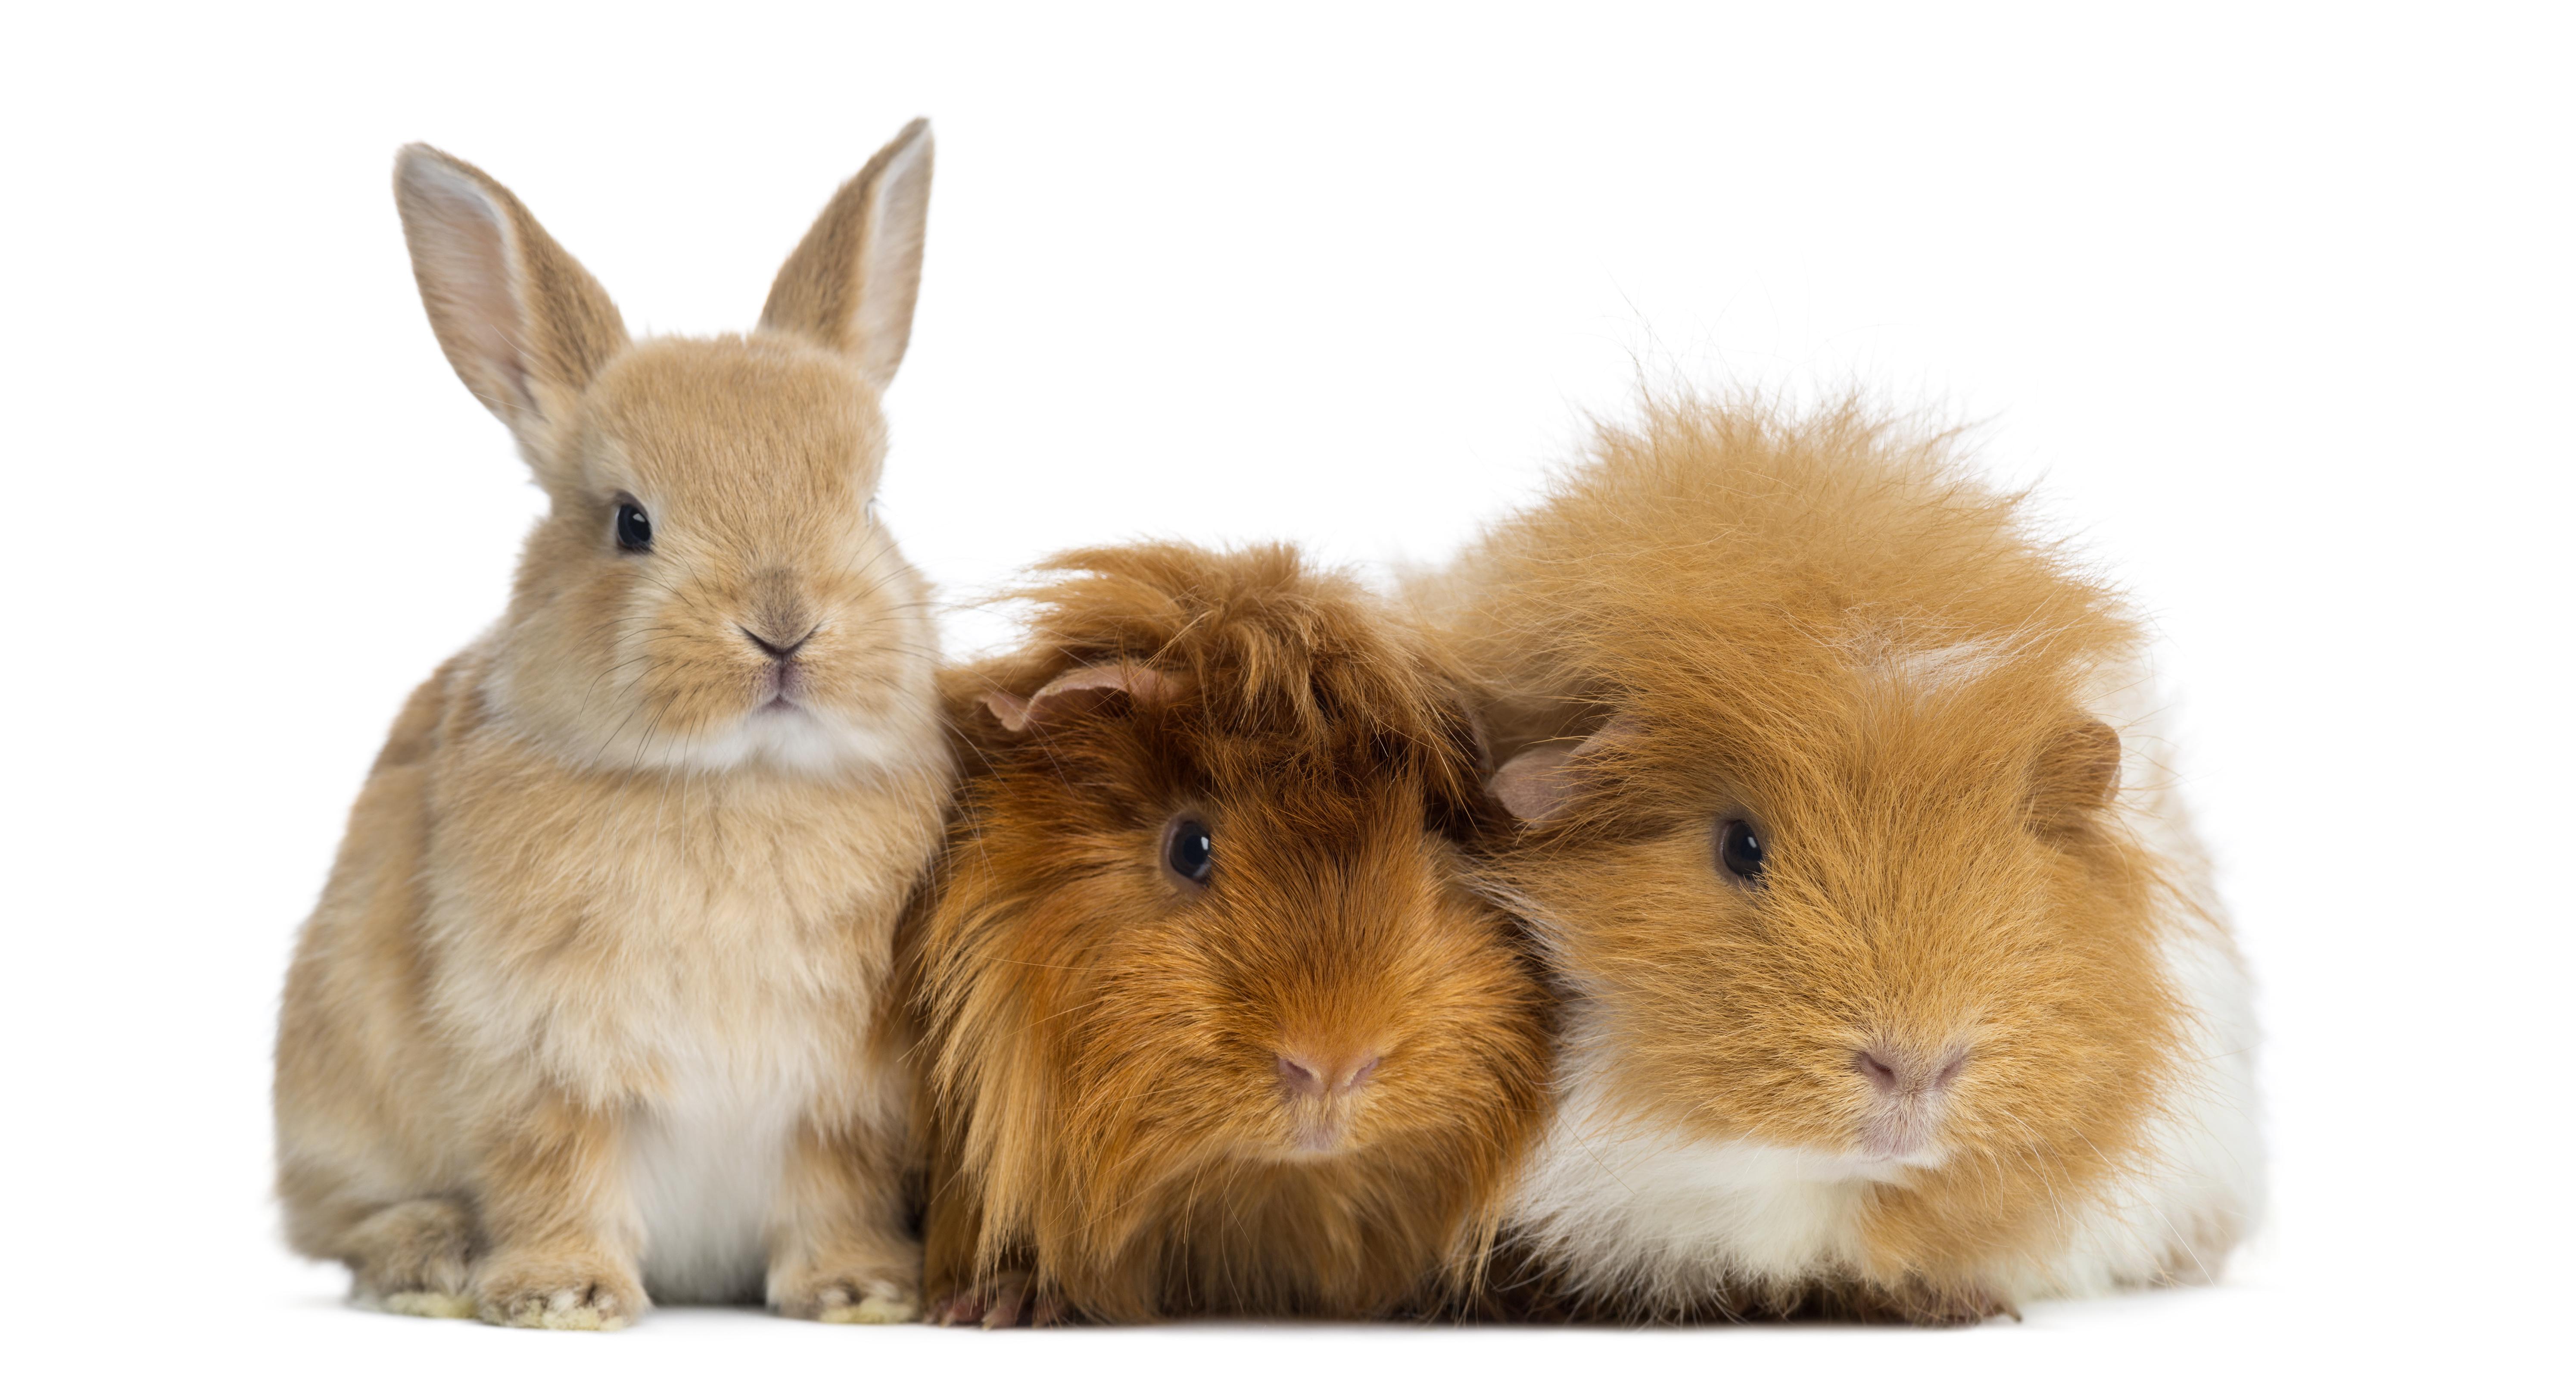 dwarf rabbit, pet rabbit, pet rabbits, pet mammals, pet guinea pig, guinea pig, lionhead guinea pig, exotic animals, exotic veterinarian, exotic vet, phoenix, arizona, avian and exotic animal clinic, exotic animal hospital, exotic animal clinic